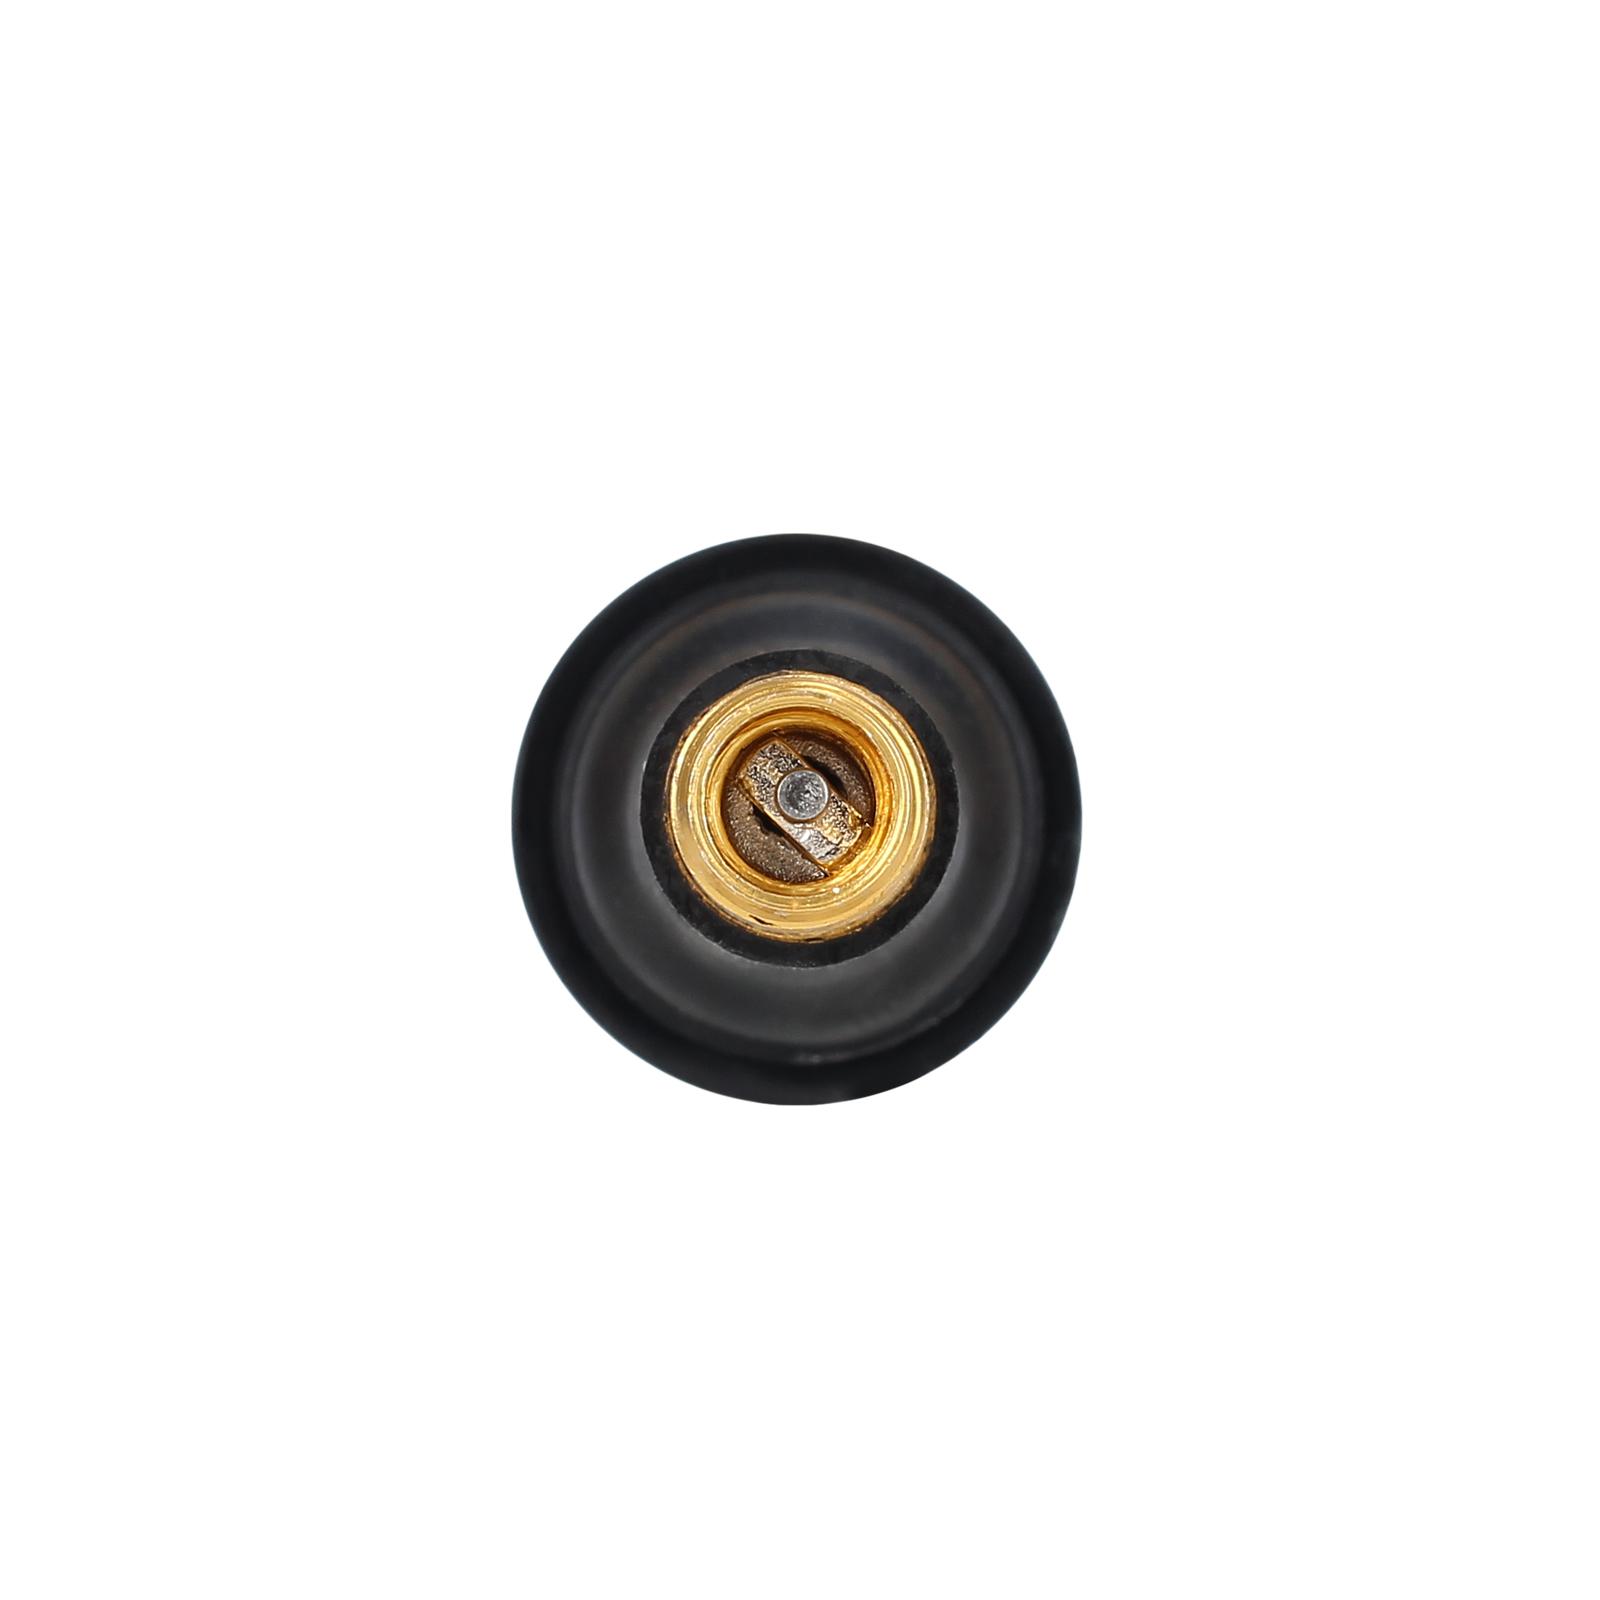 100PCS NEW Tire Valve Stems Assortment OEM TR413 65 MAX PSI High Performance US